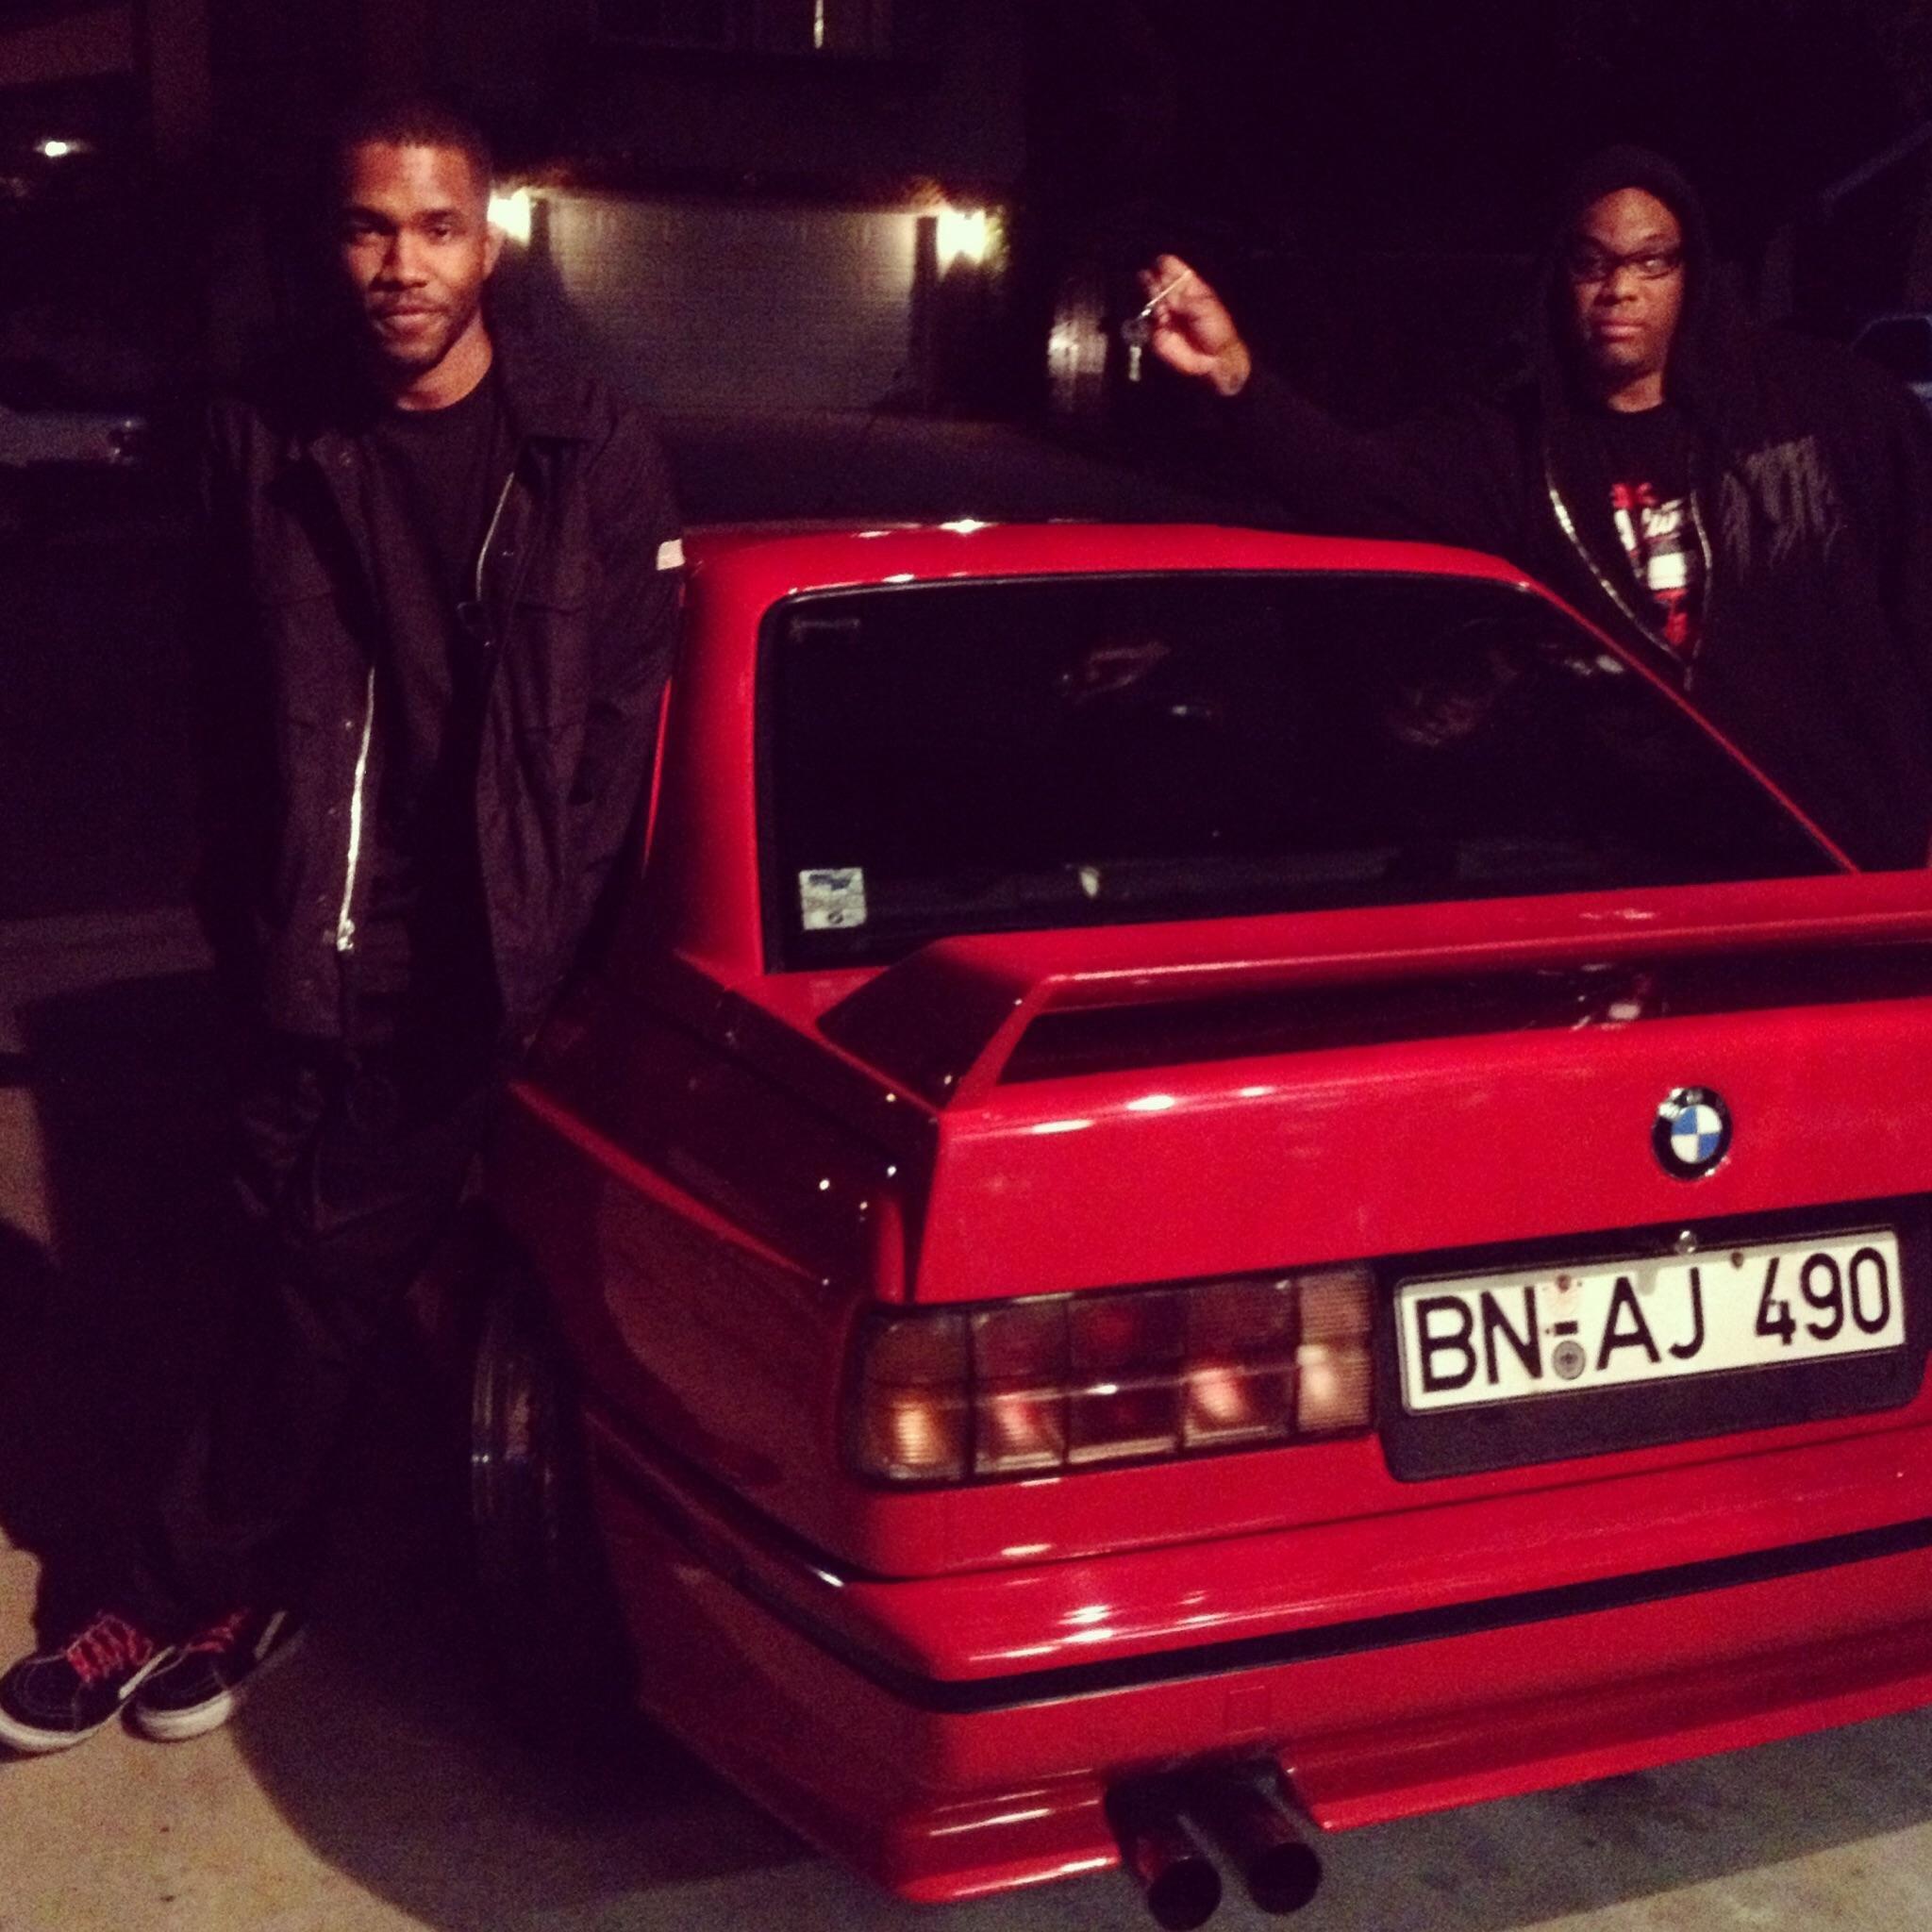 Frank Ocean buying my neighbor Jon's E30 M3 BMW cars M3